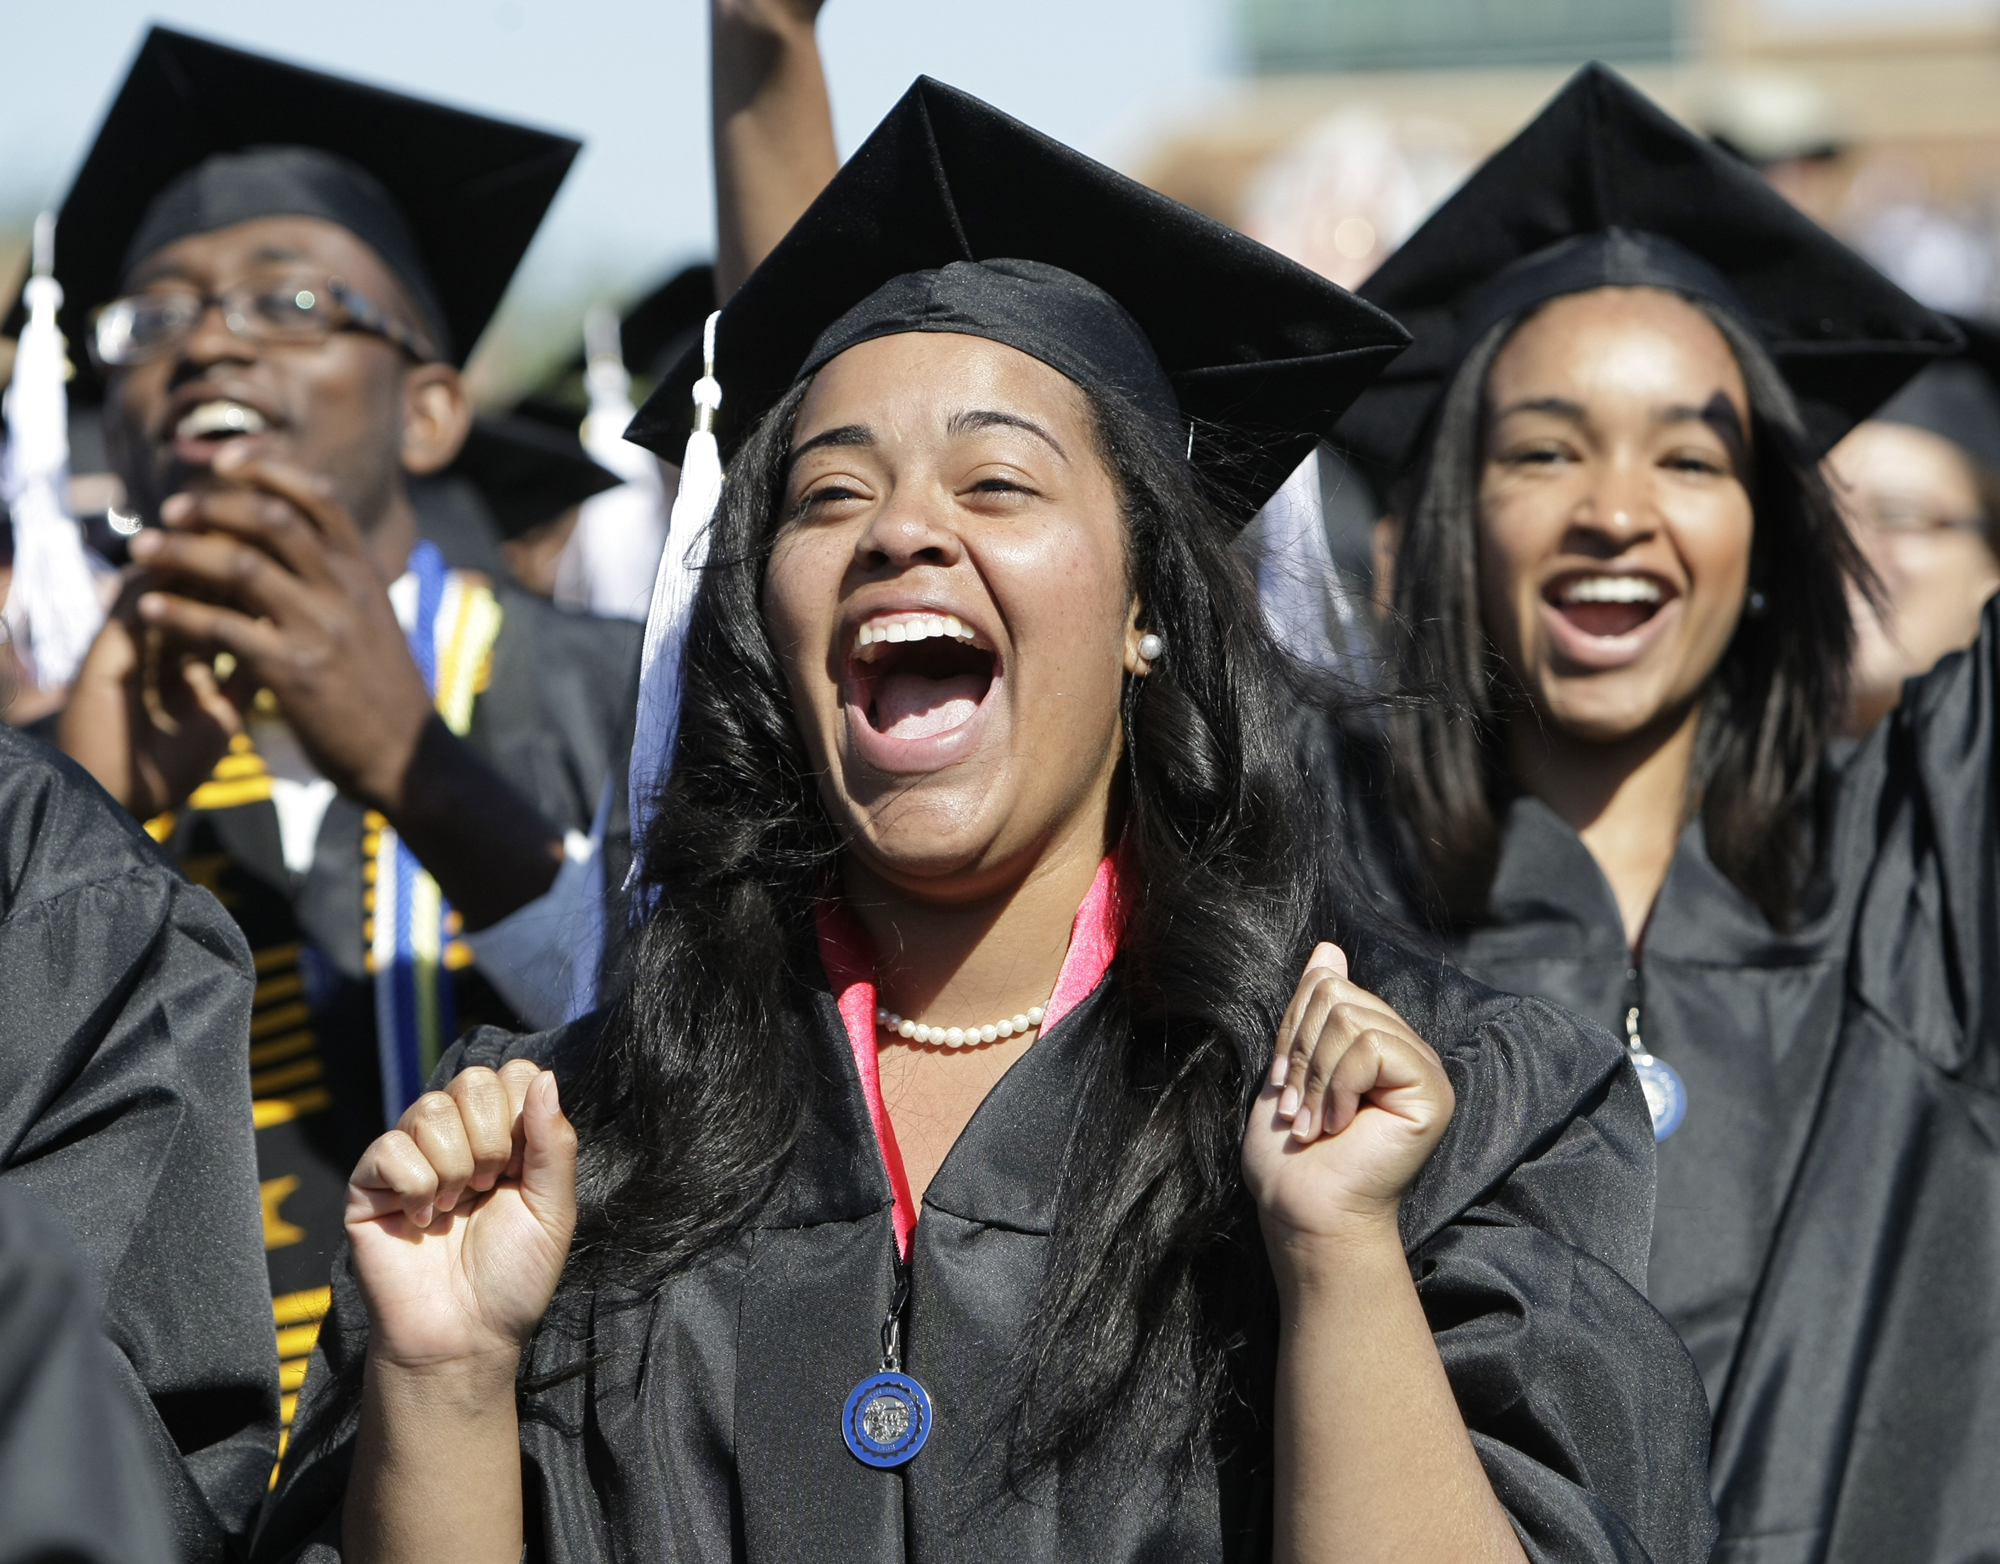 Tara Haskins of Virginia Beach, Va., shouts as President Barack Obama arrives at graduation ceremonies at Hampton University, a historically black university, at the school's Armstrong Stadium, in Hampton, Va., Sunday, May 9, 2010.